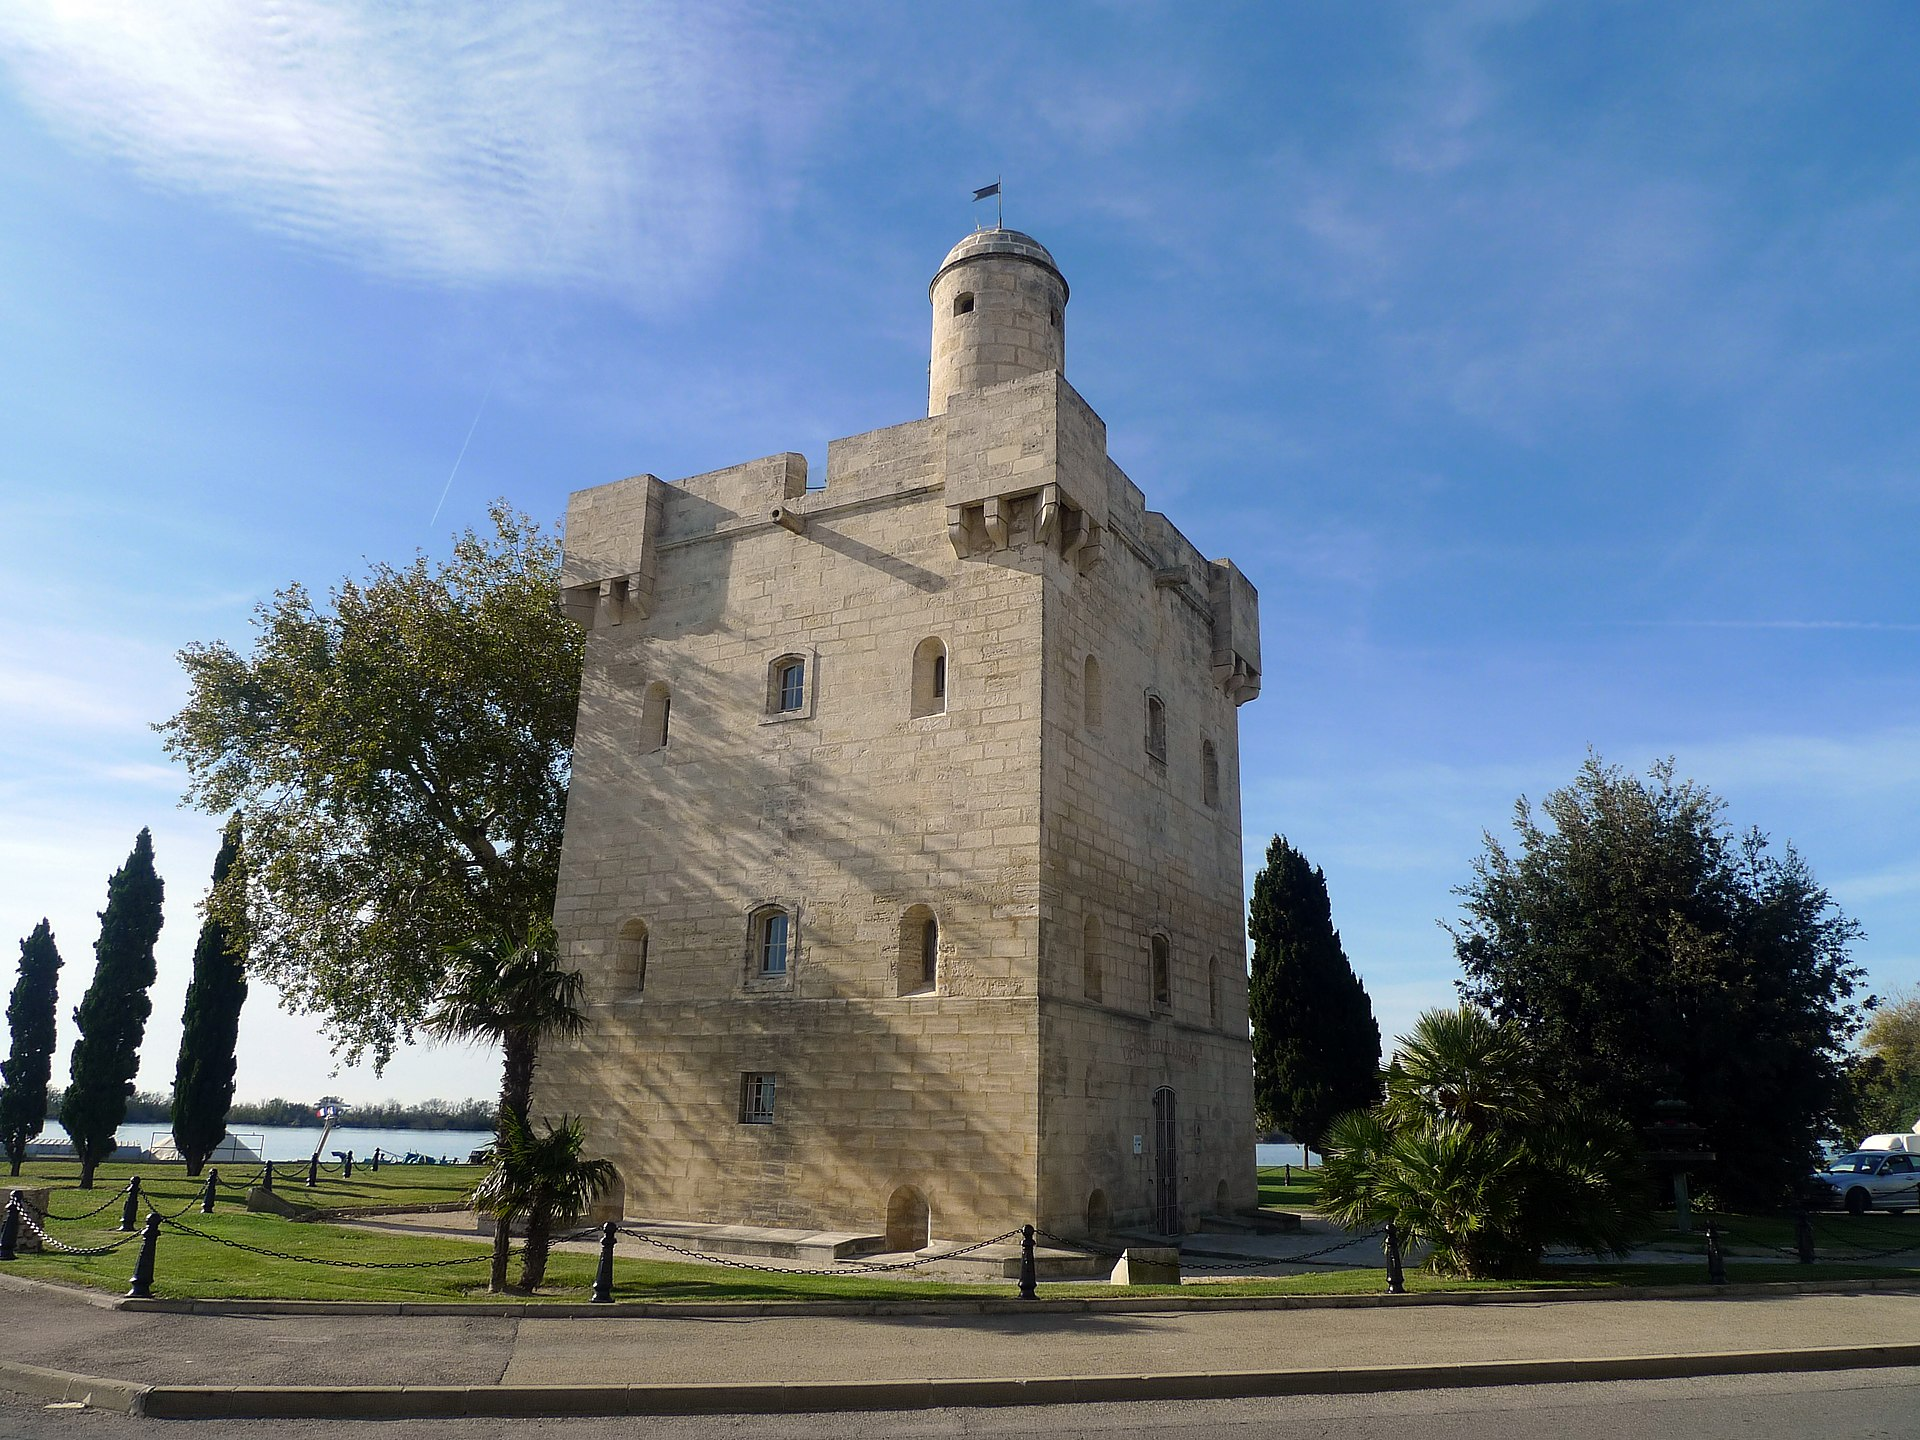 Port saint louis du rh ne wikipedia for Porte st louis